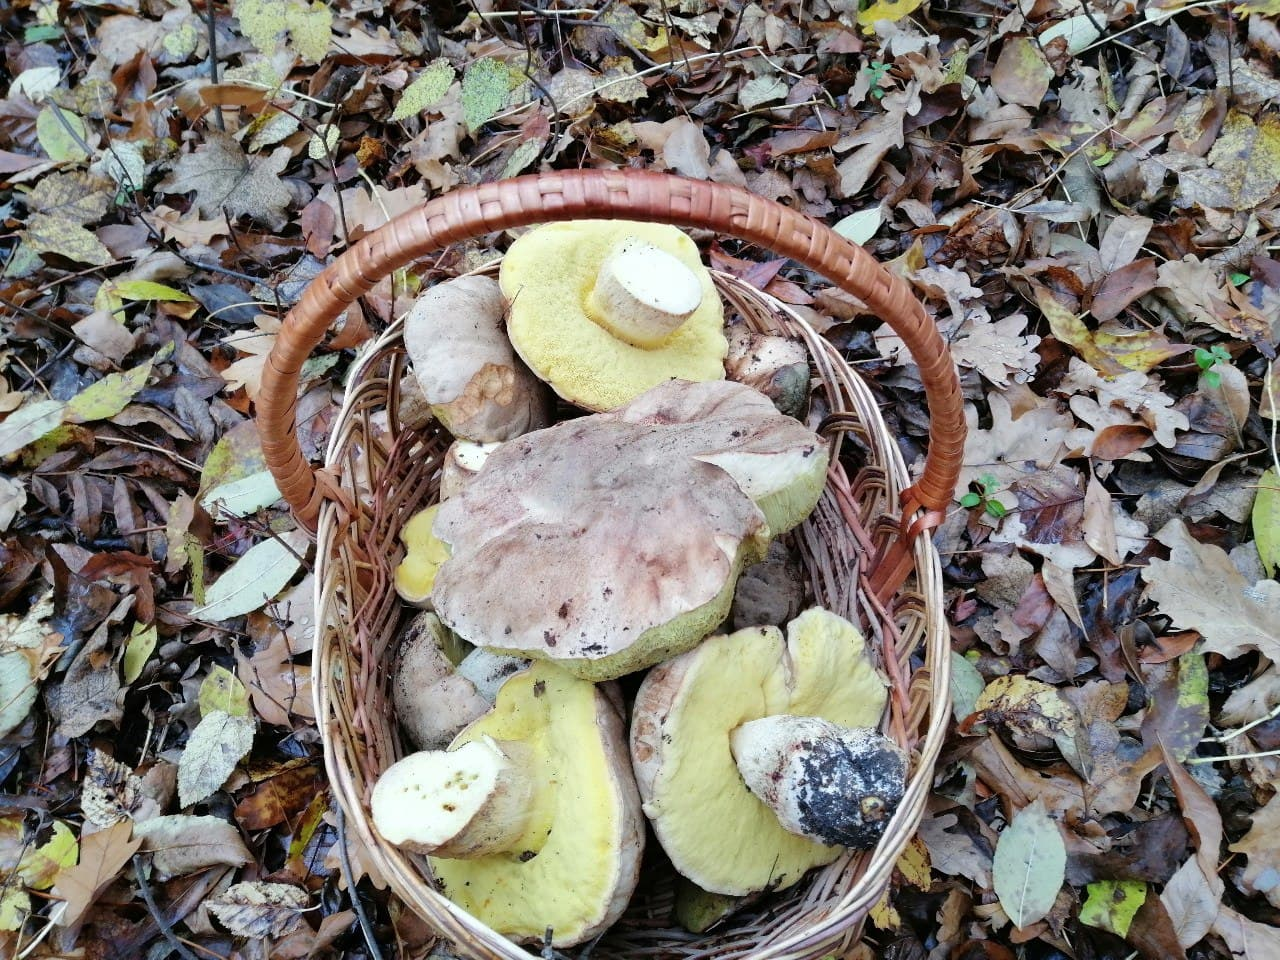 Полубелый гриб Hemileccinum impolitum